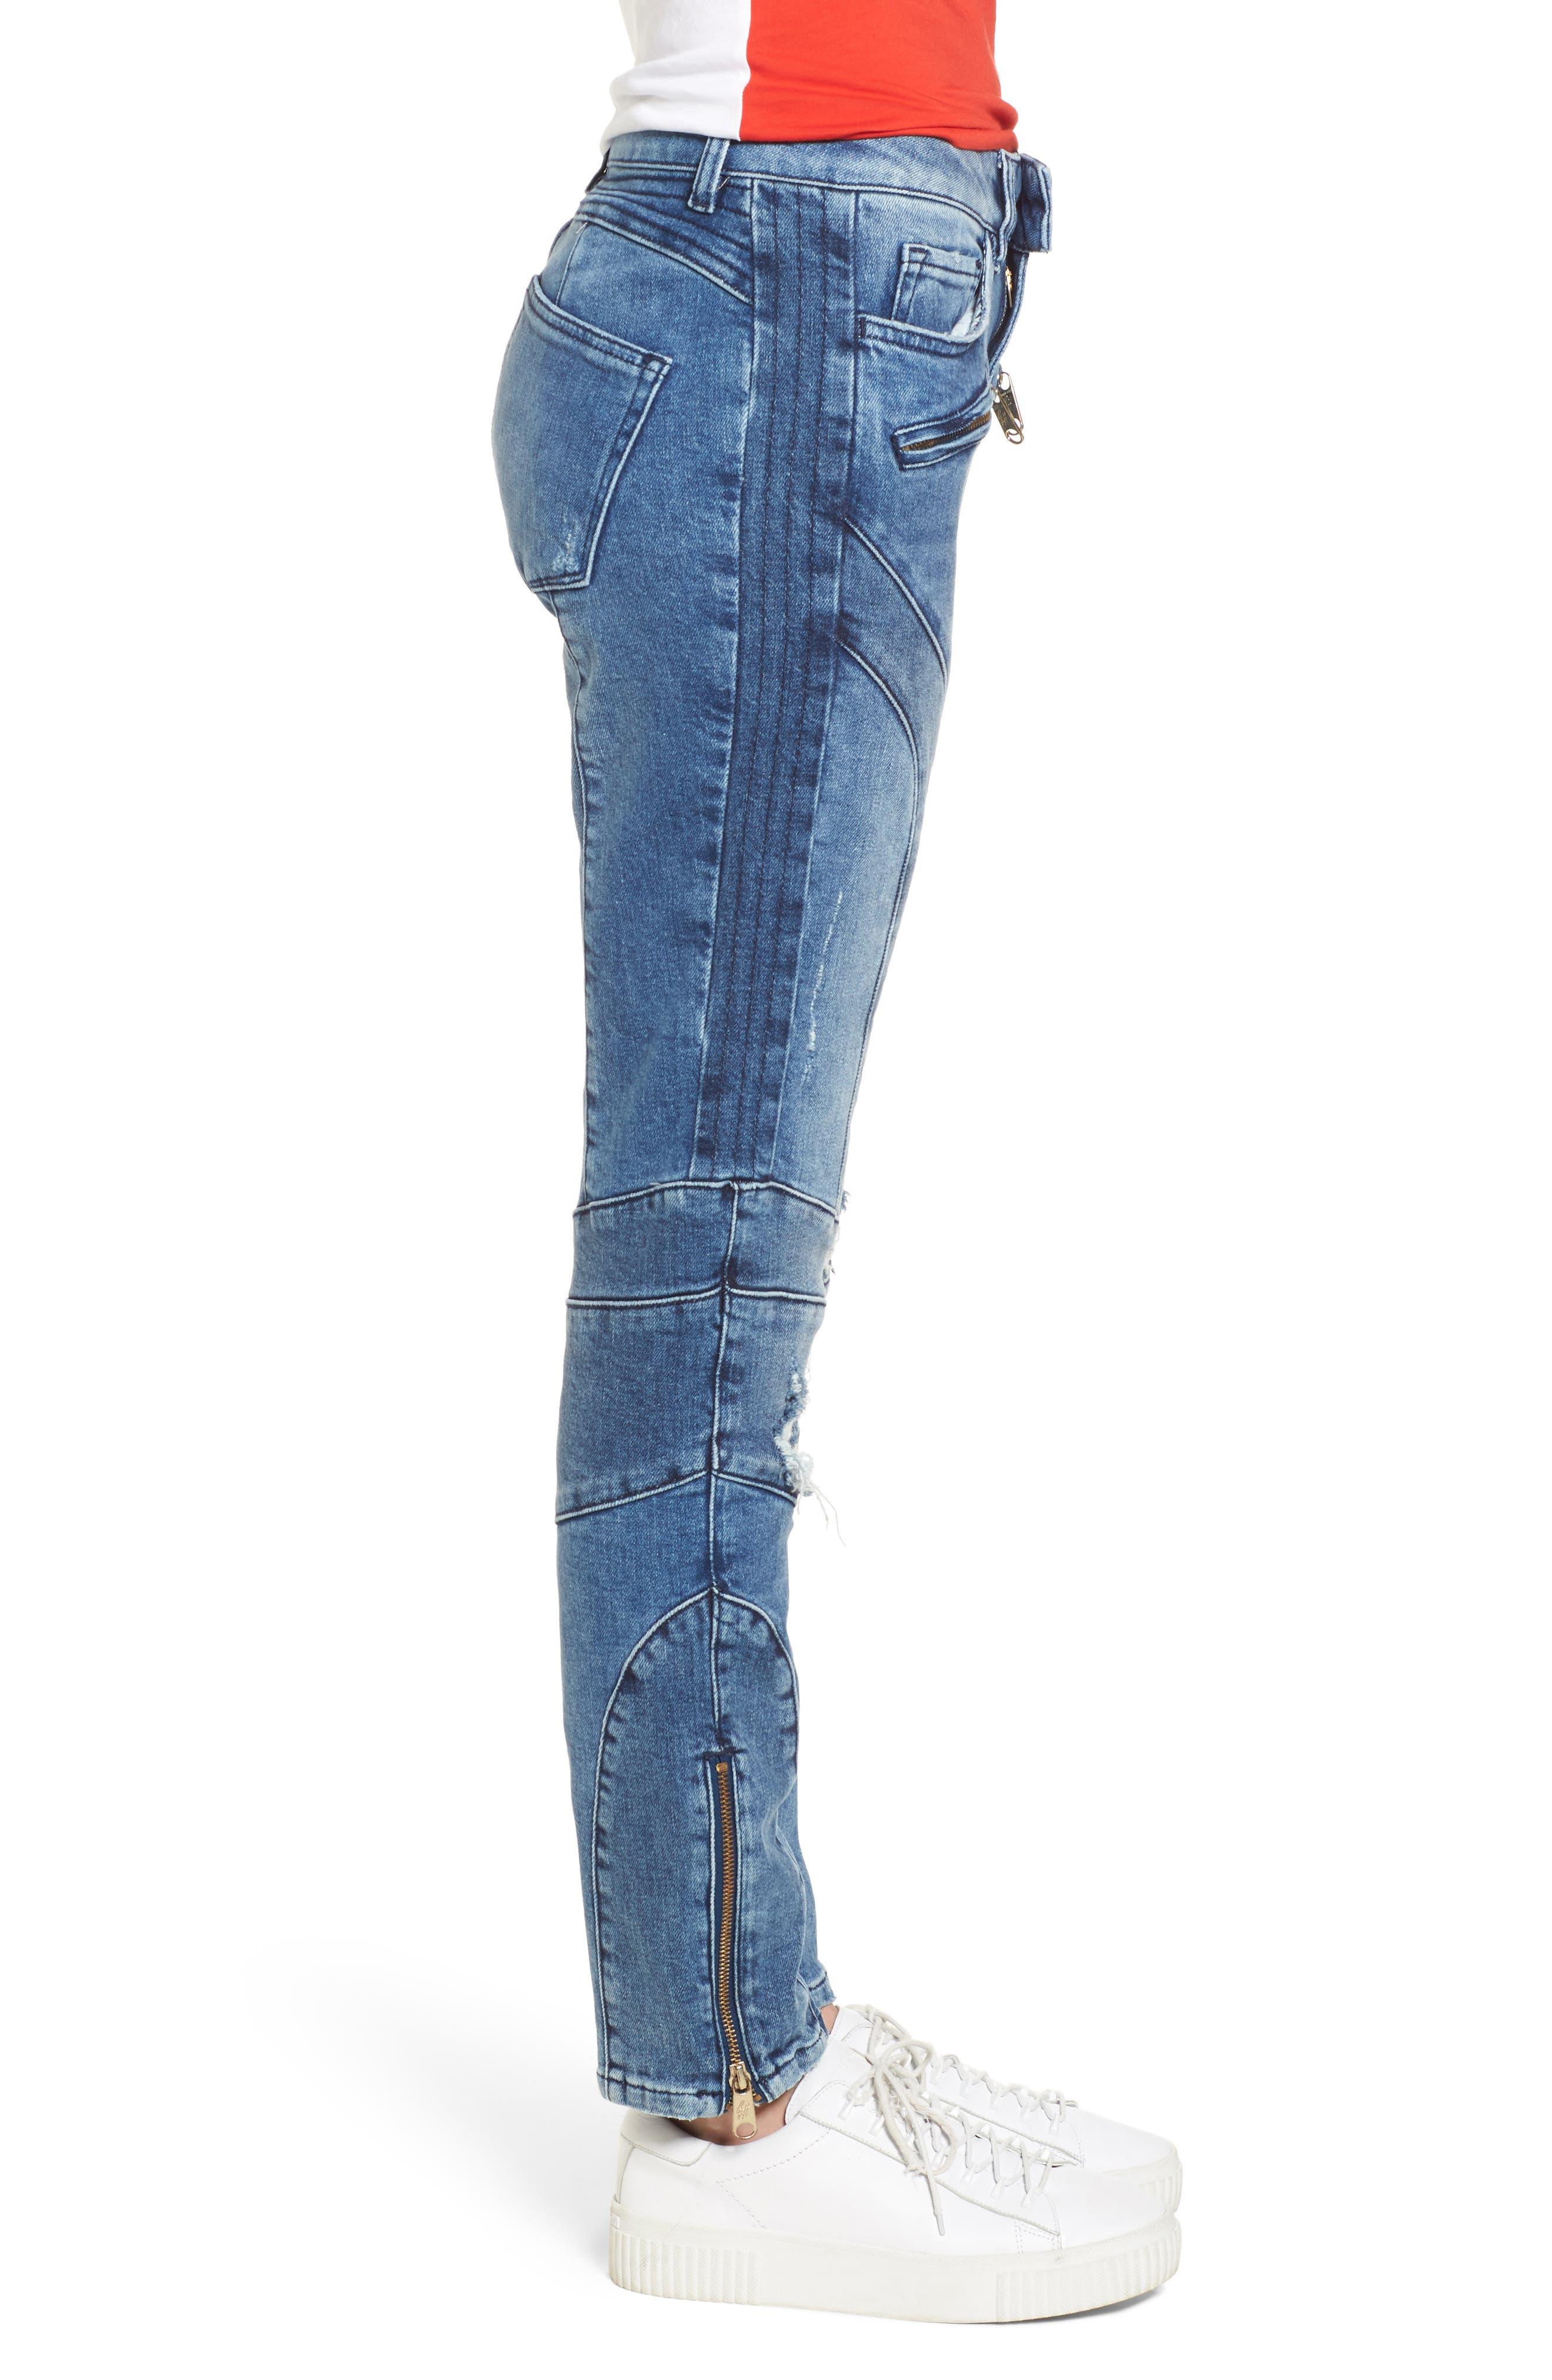 x Gigi Hadid Speed Distressed Ankle Zip Jeans,                             Alternate thumbnail 4, color,                             Mid Blue